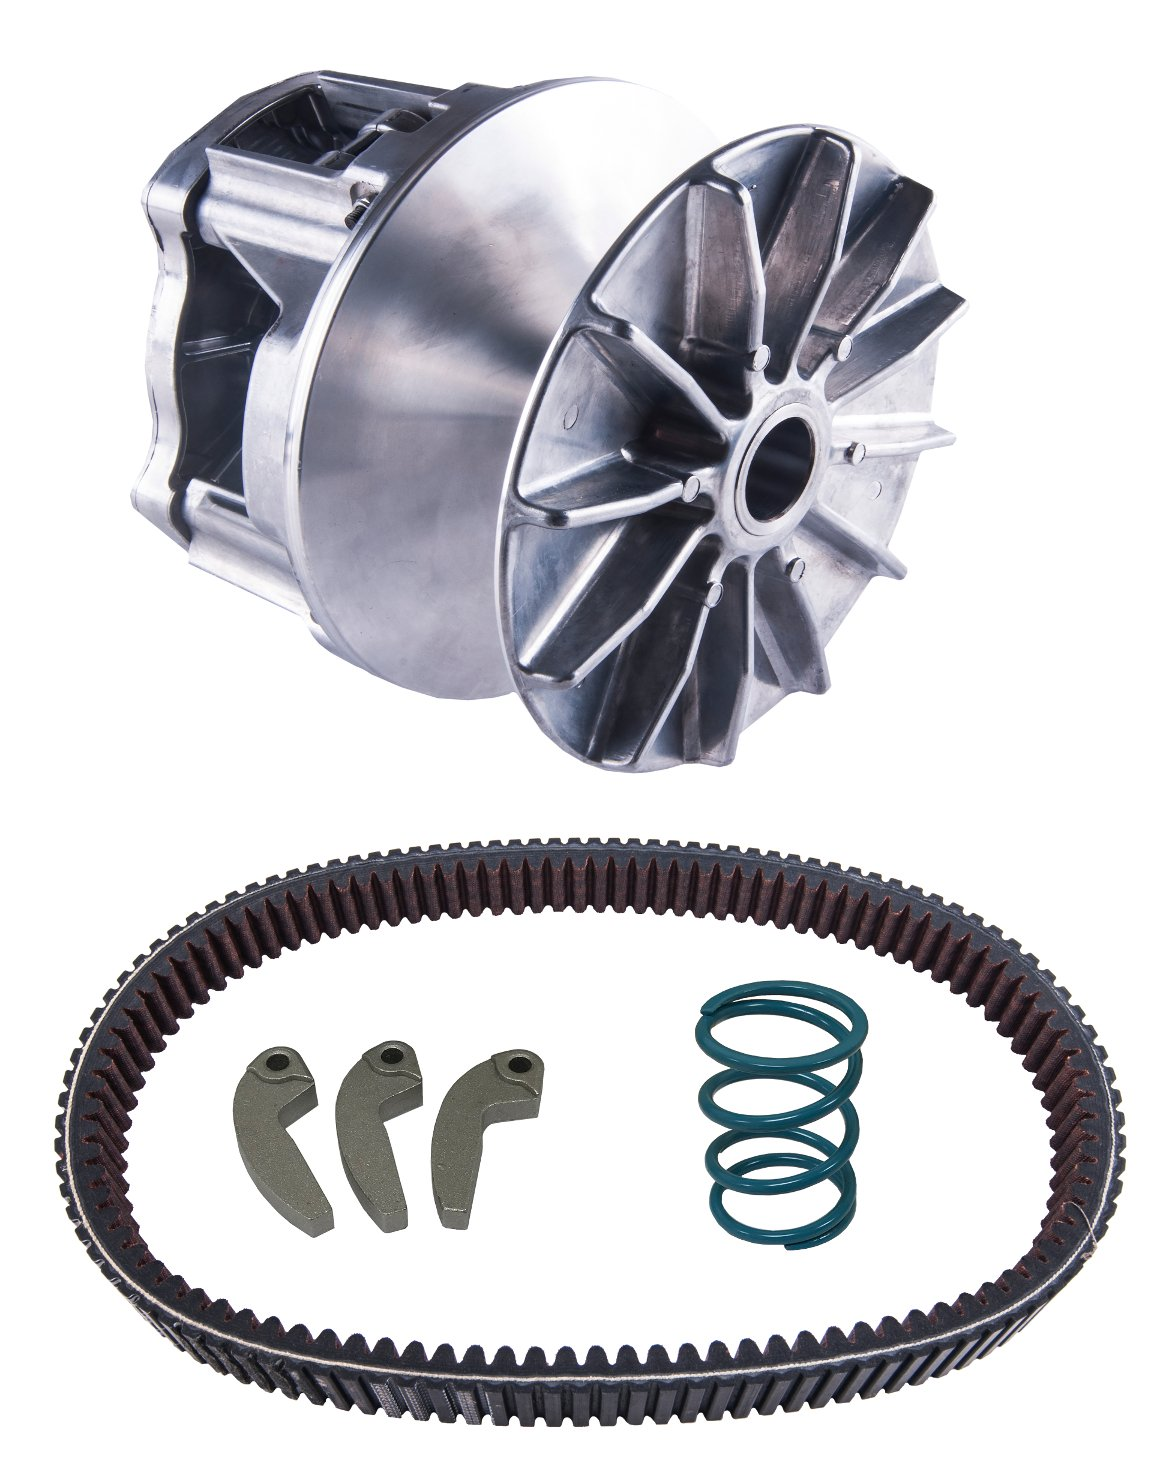 Polaris 300 / 400L / Sport 400 L CVT clutch and belt 1994 1995 1996 1997 1998 1321632